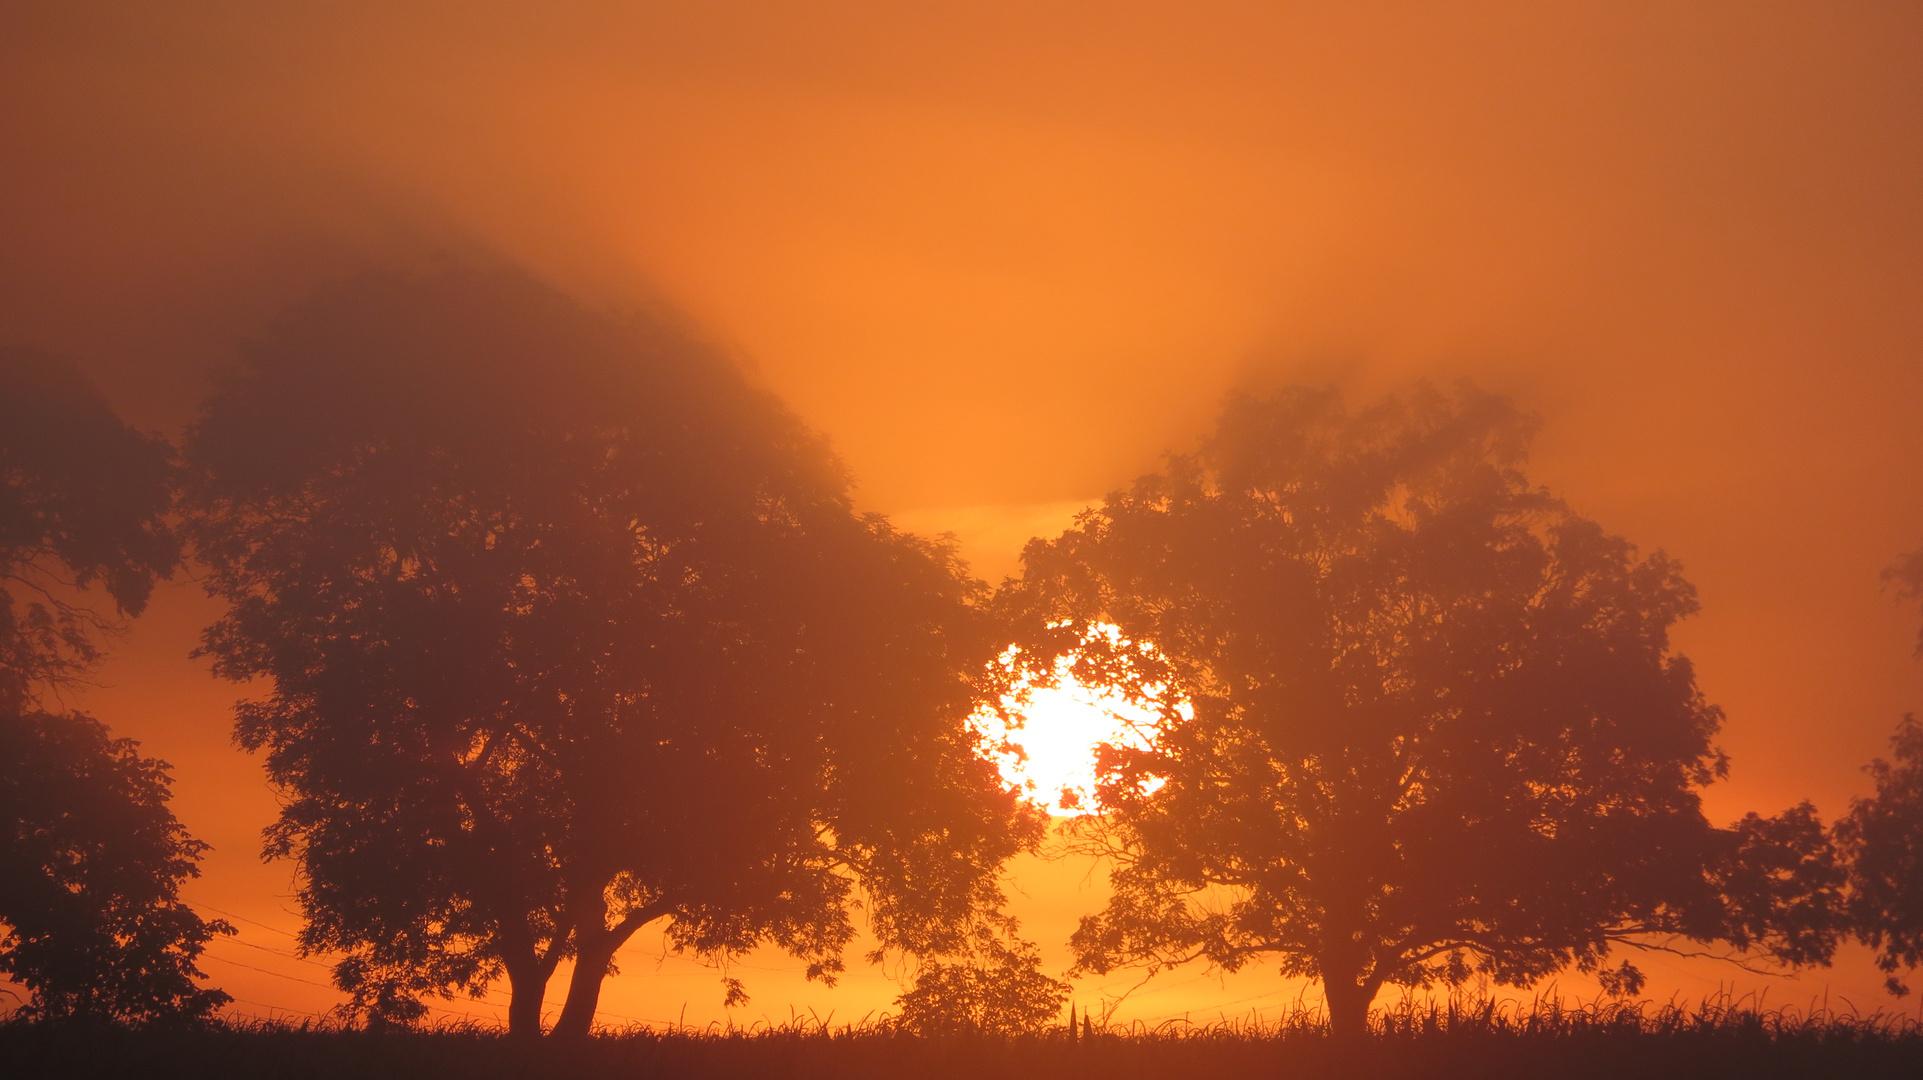 Sonnenaufgang am Herbstanfang